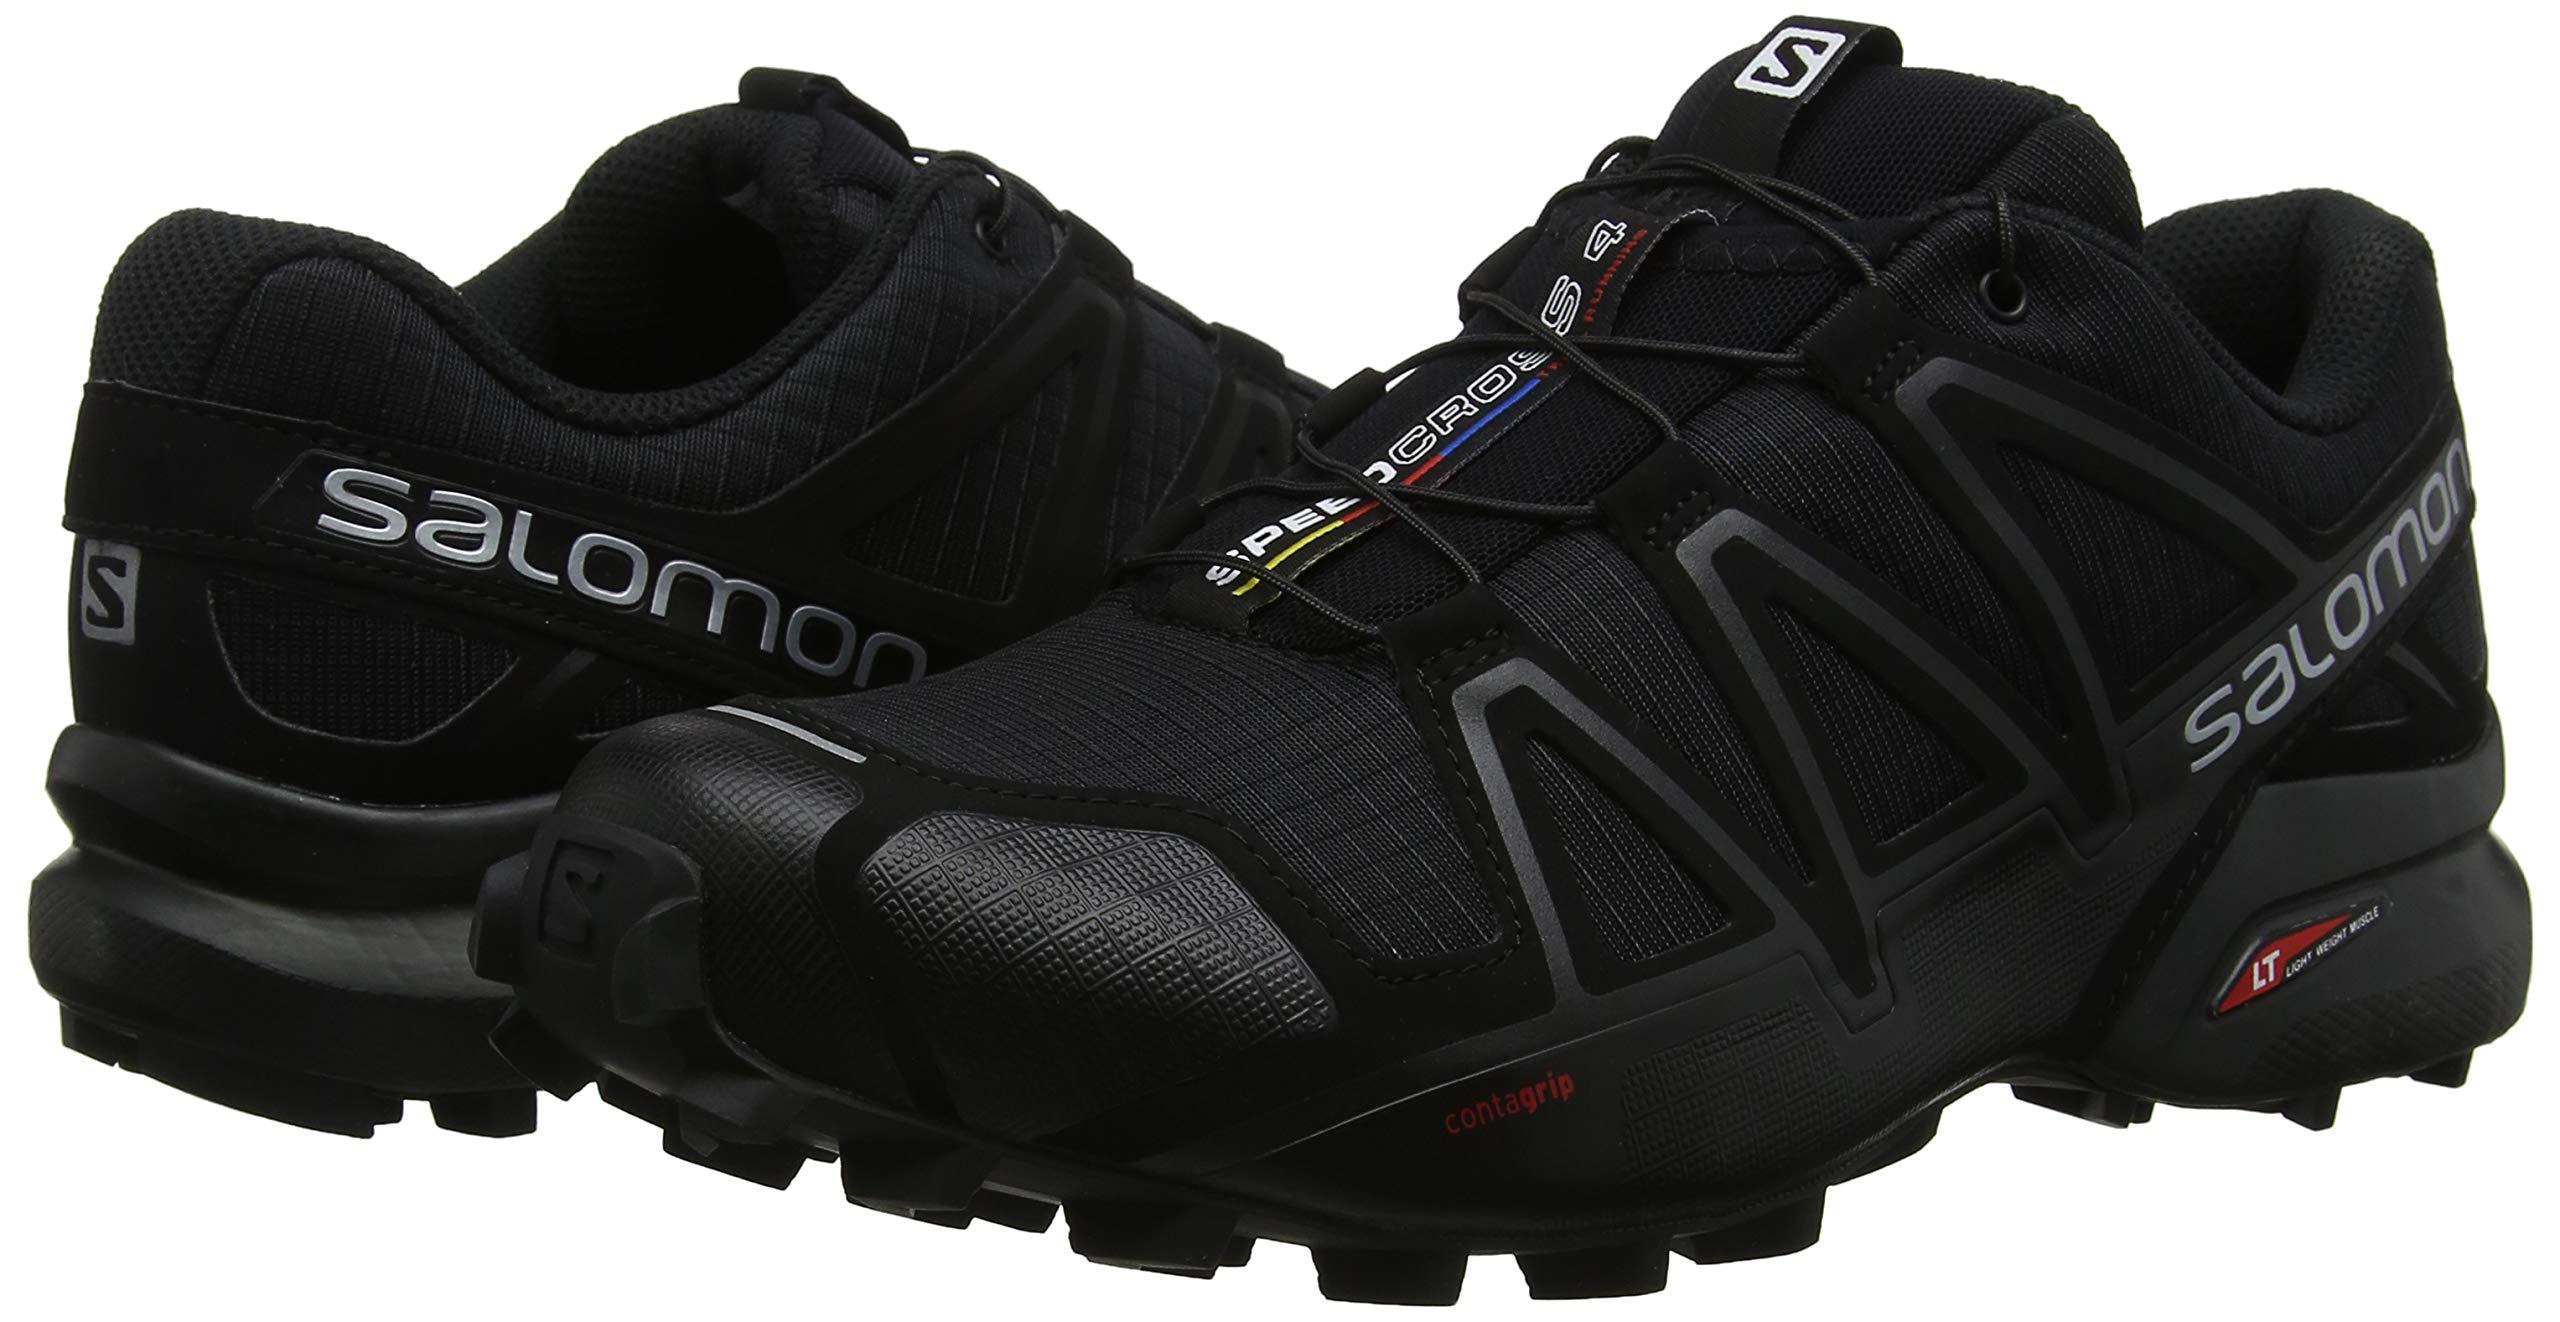 Salomon Men's Speedcross 4 Trail Runner, Black A1U8, 7 M US by Salomon (Image #5)